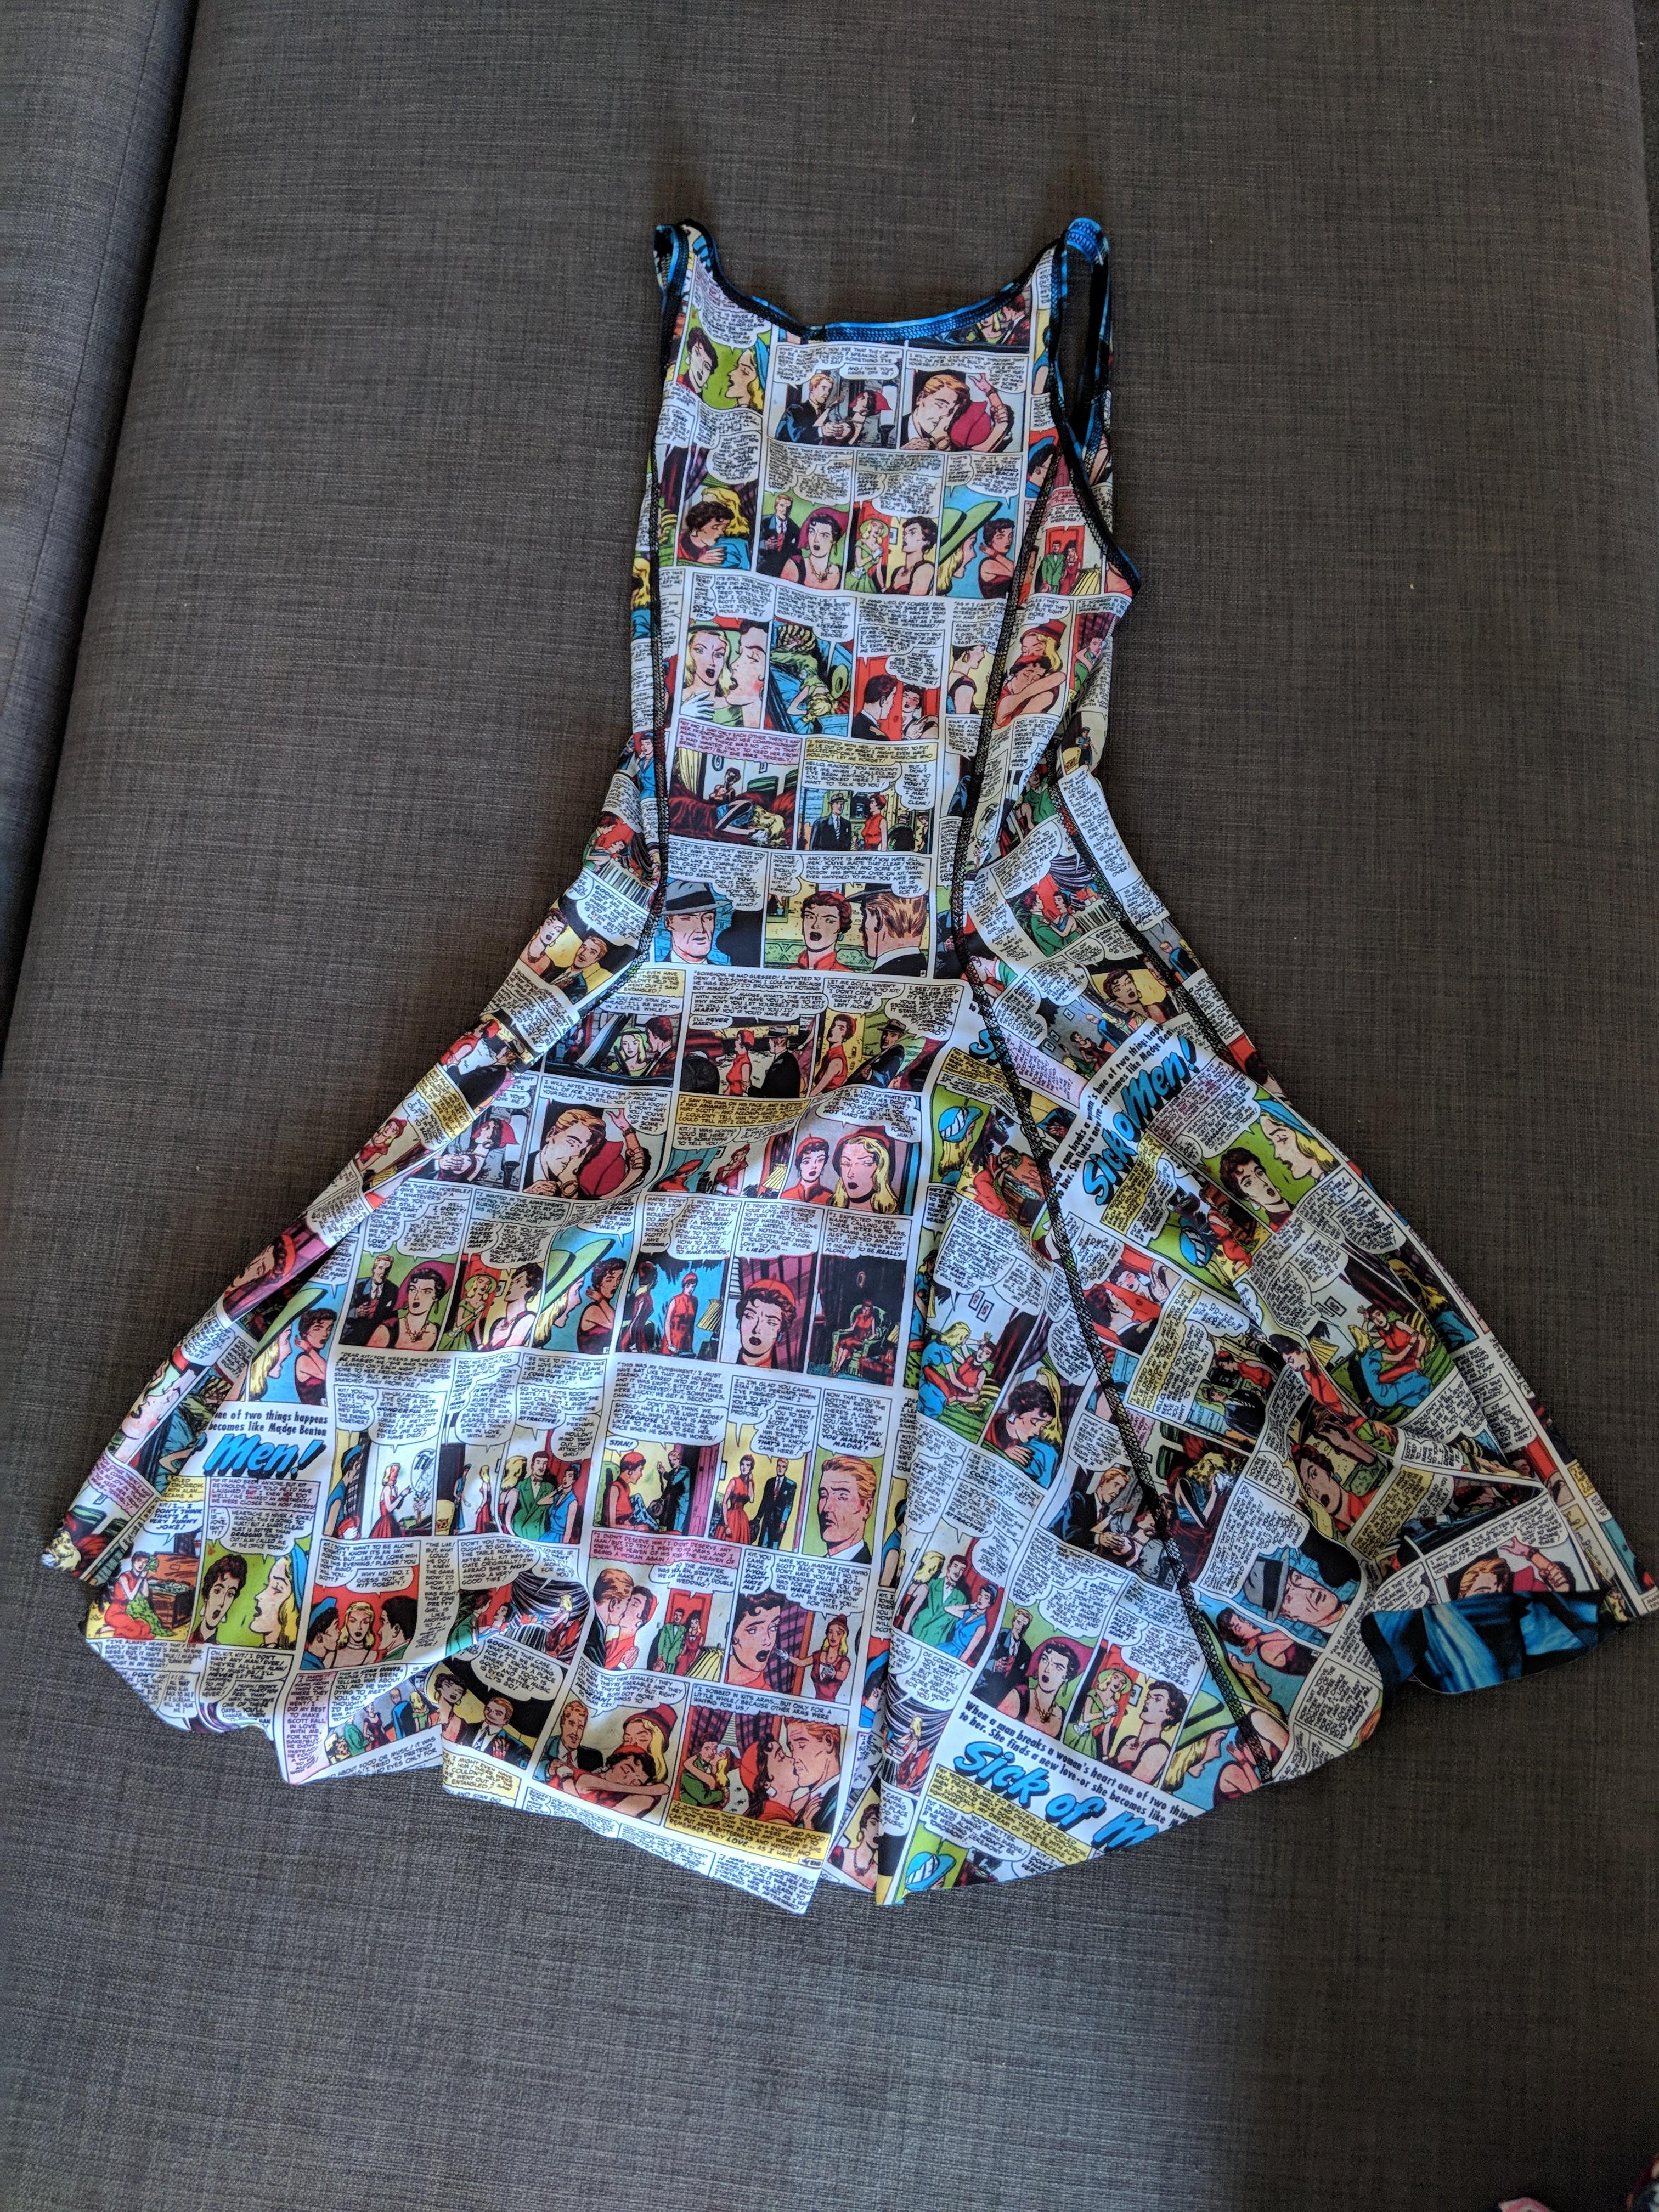 BNWOT Black Milk reversible Dress